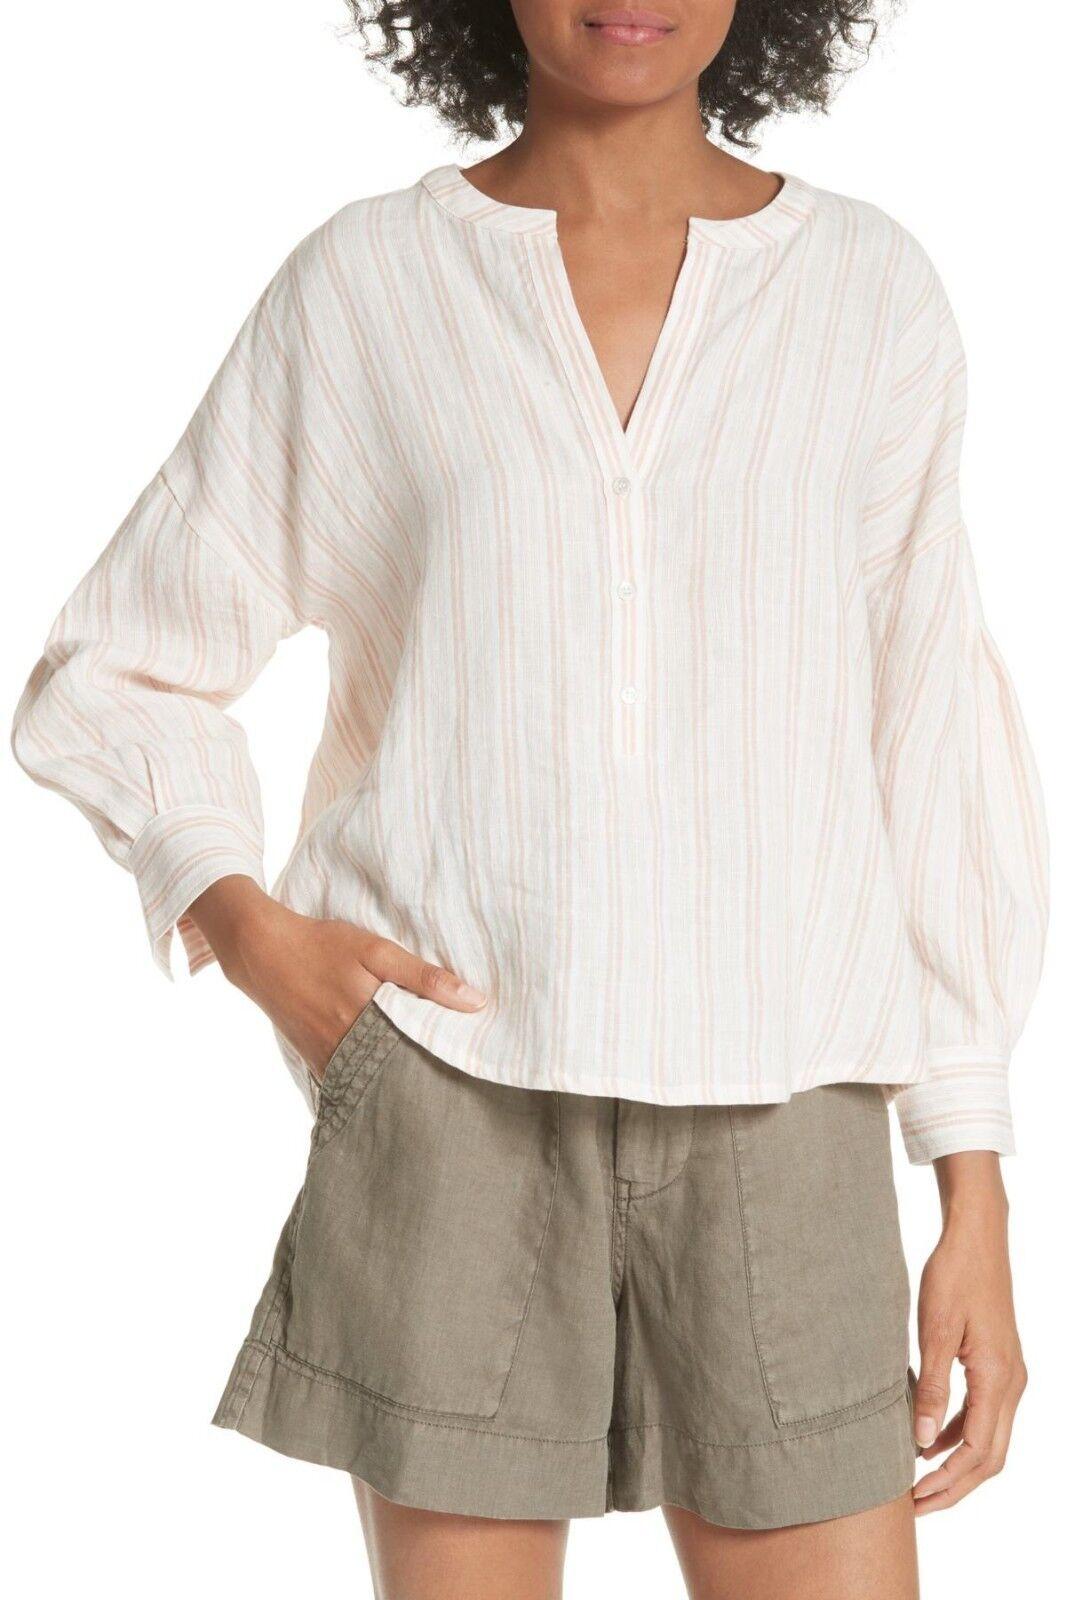 NWT- Joie Bekette Collarless Stripe Linen Blouse, Blaush Sand - Größe XSmall